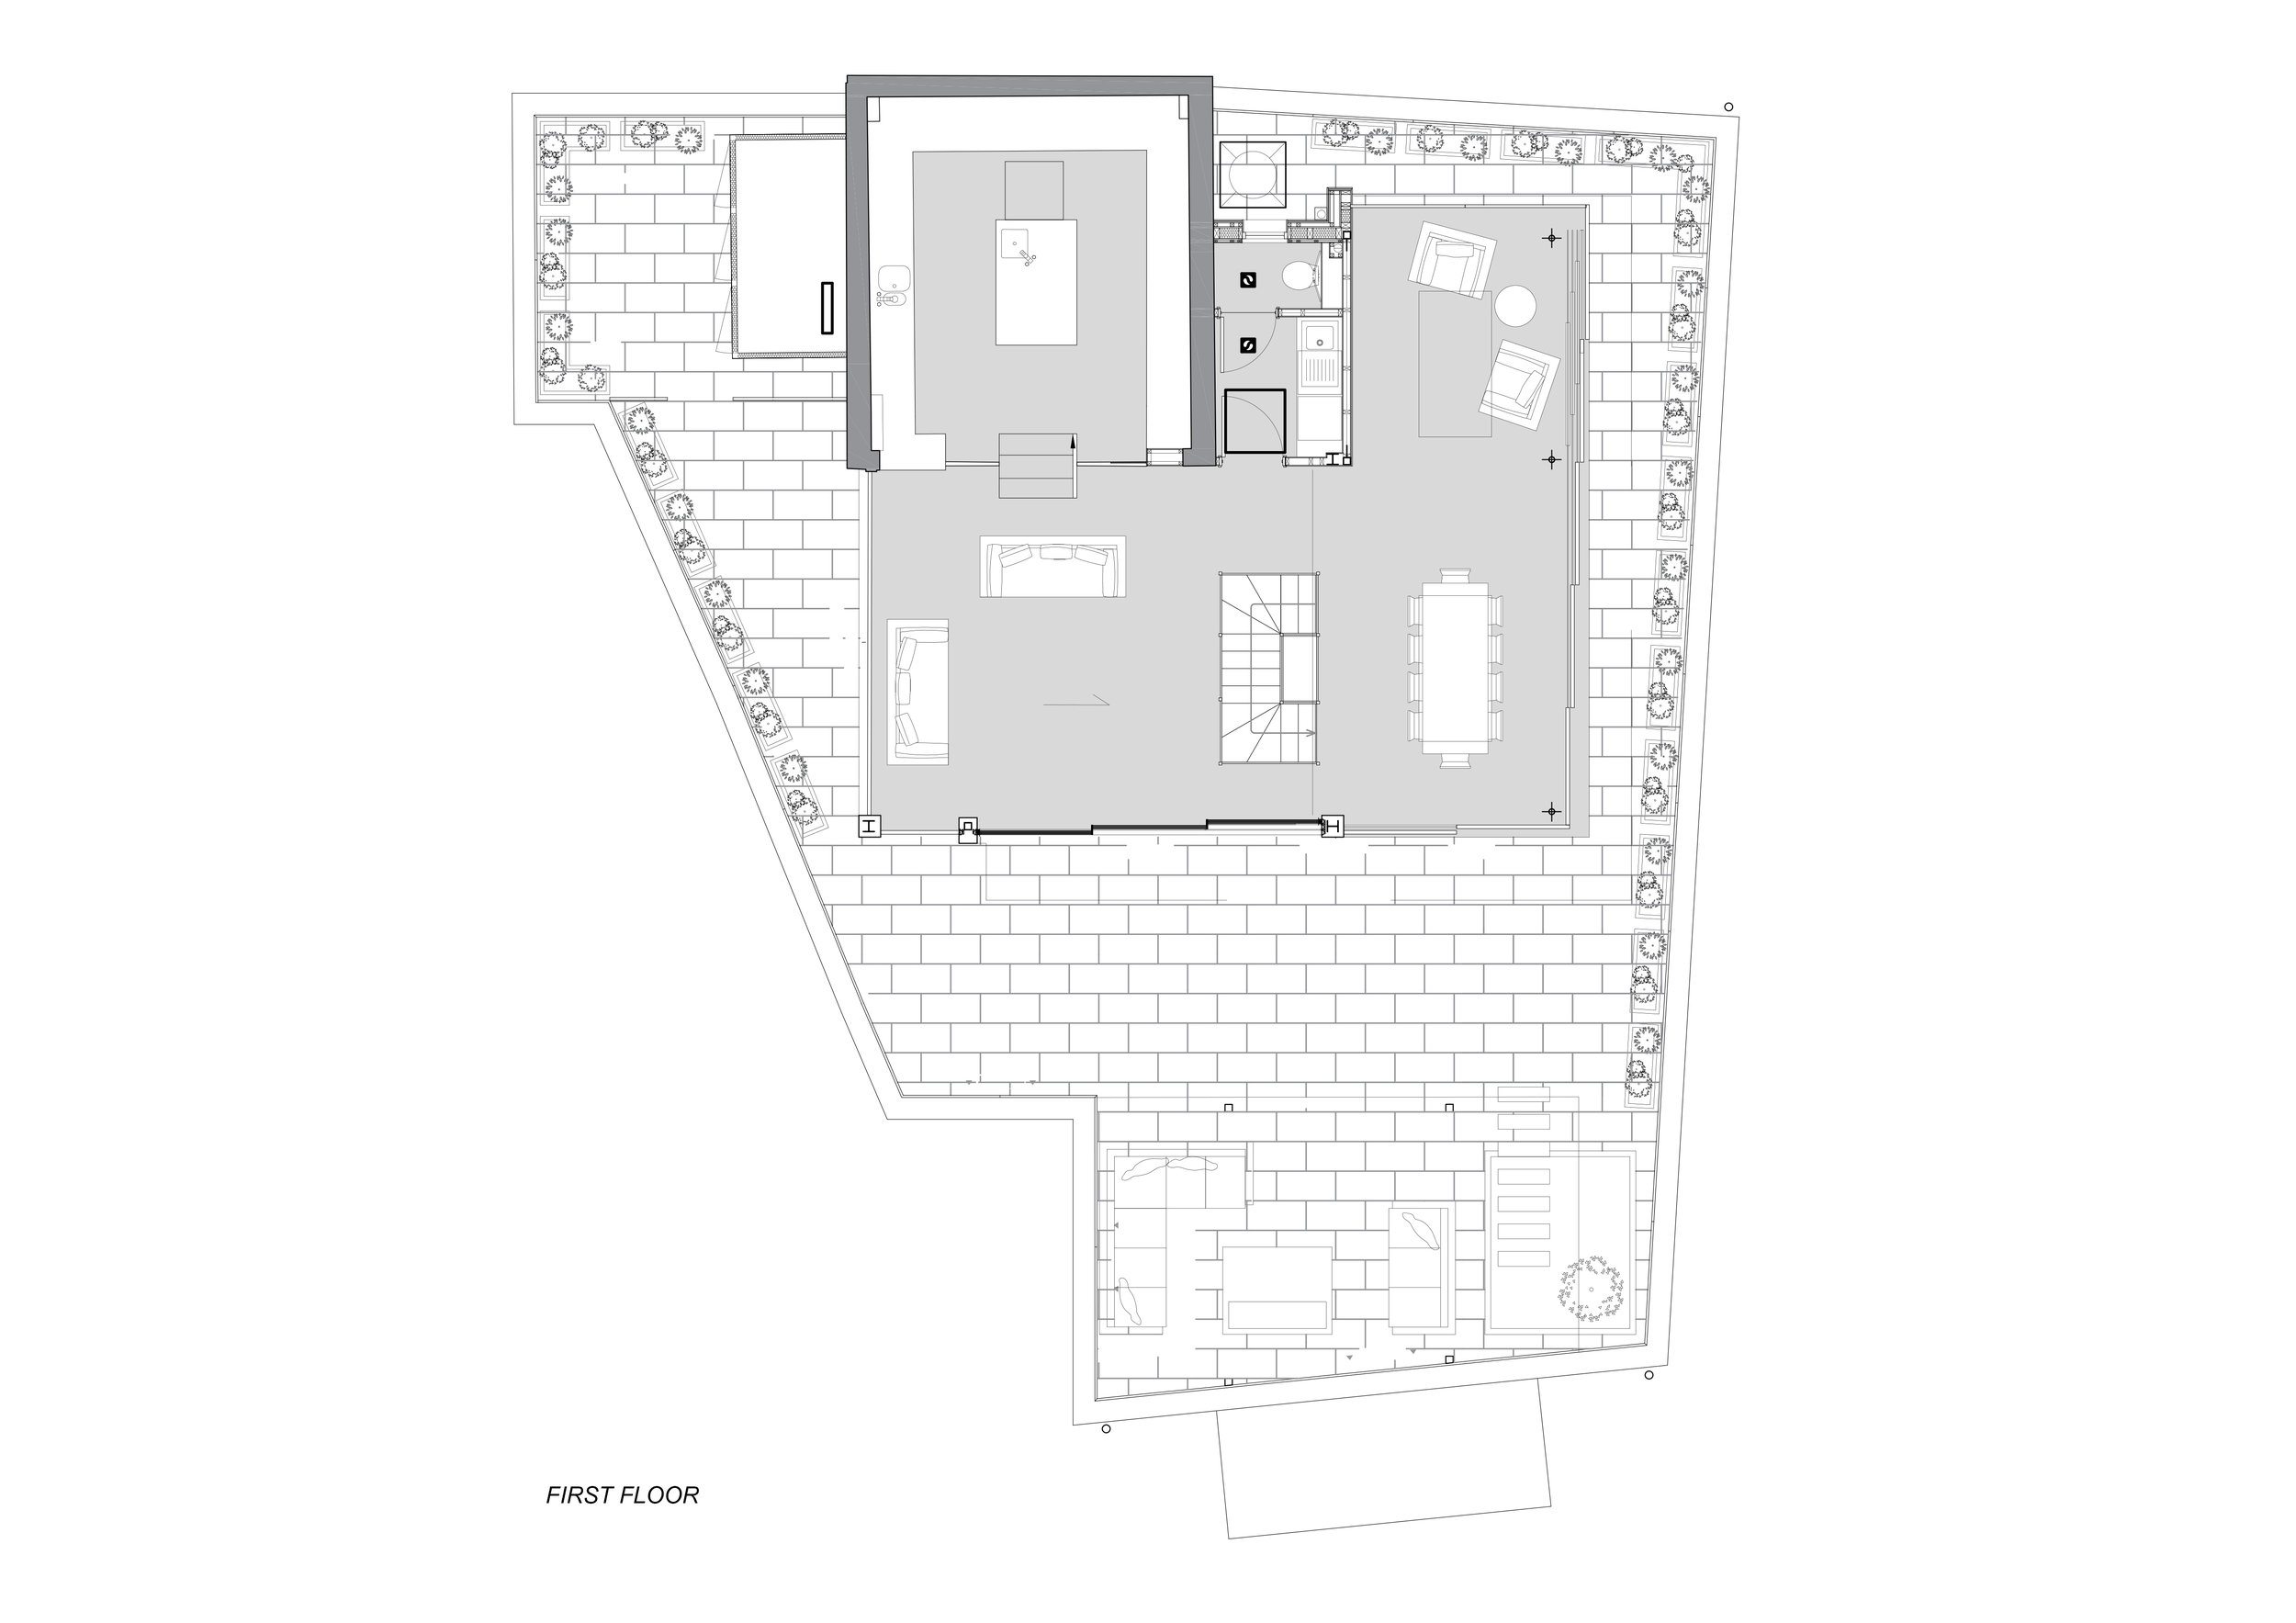 1088_11 Phoenix Wharf_Proposed - WEB OPTIMIZED FF PLAN.jpg